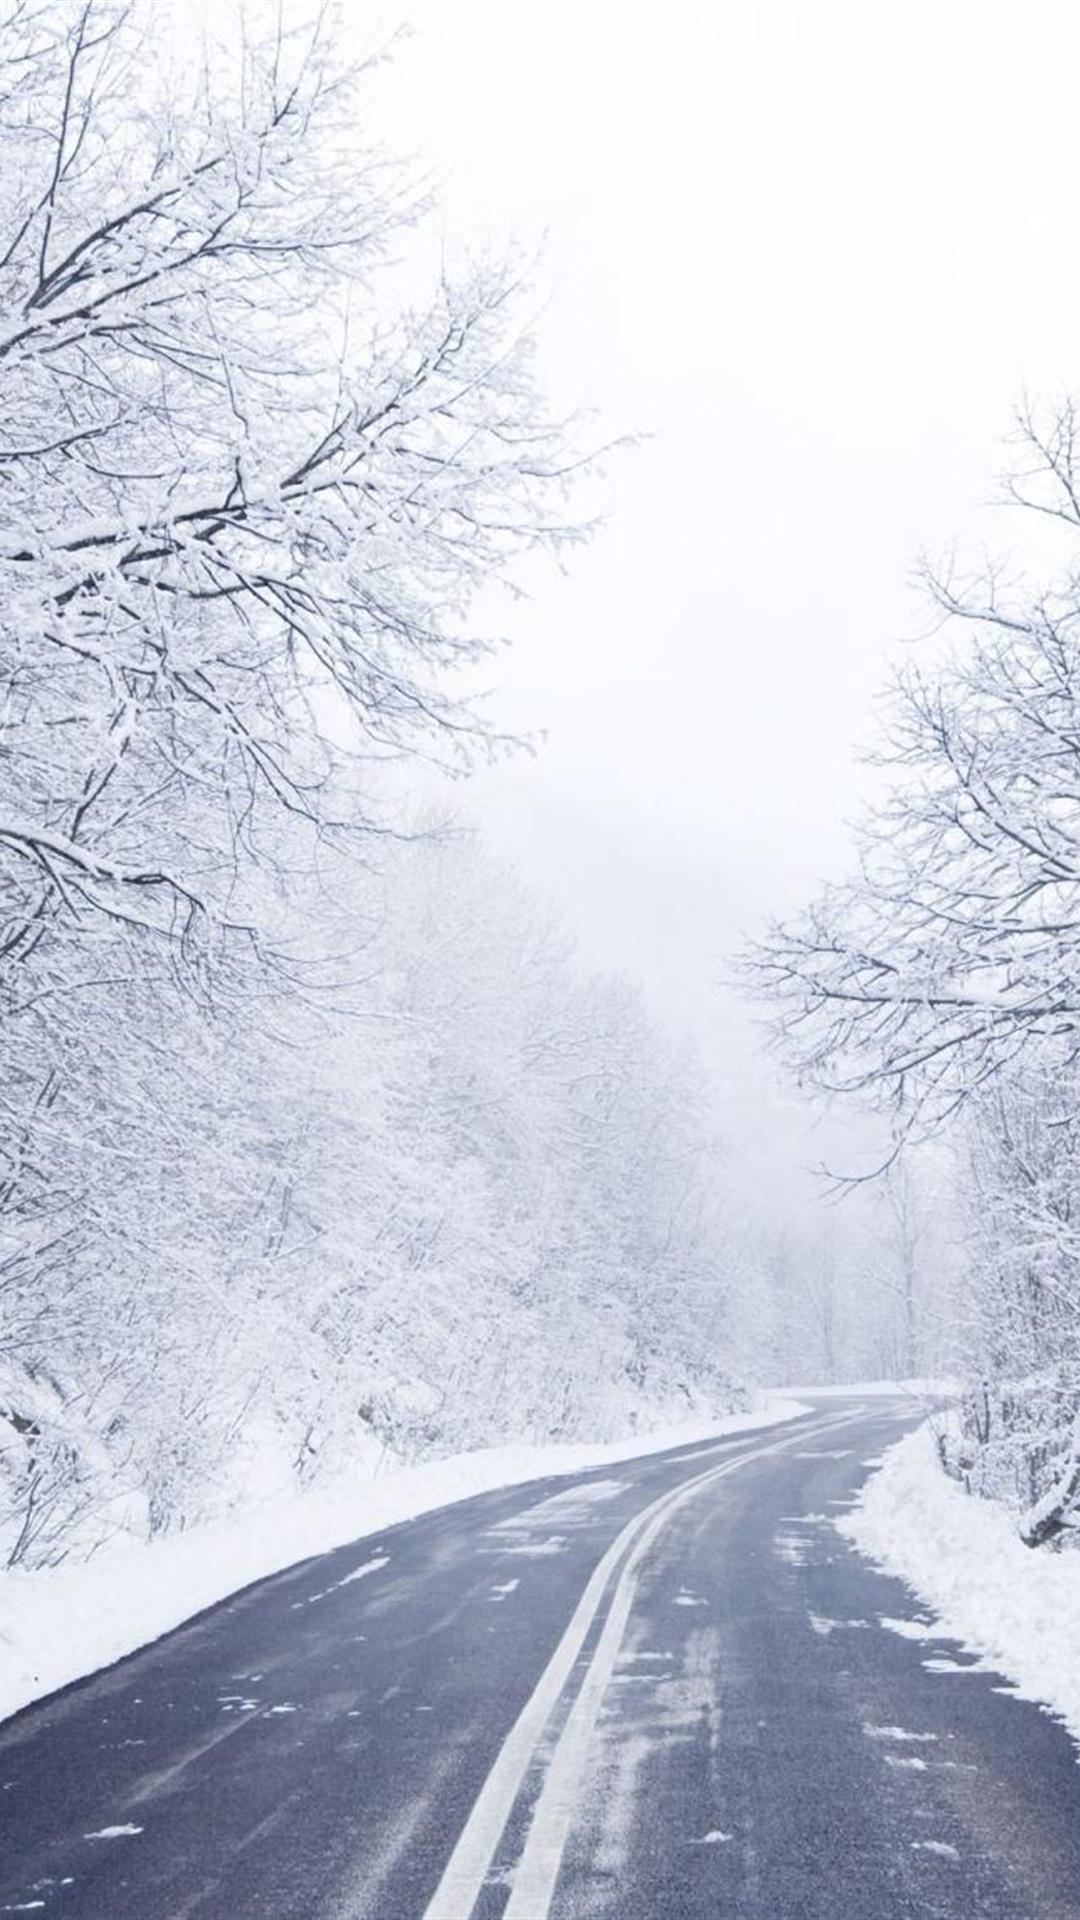 cold winter road iphone 6 plus wallpapers | WINTER WONDERLAND ...